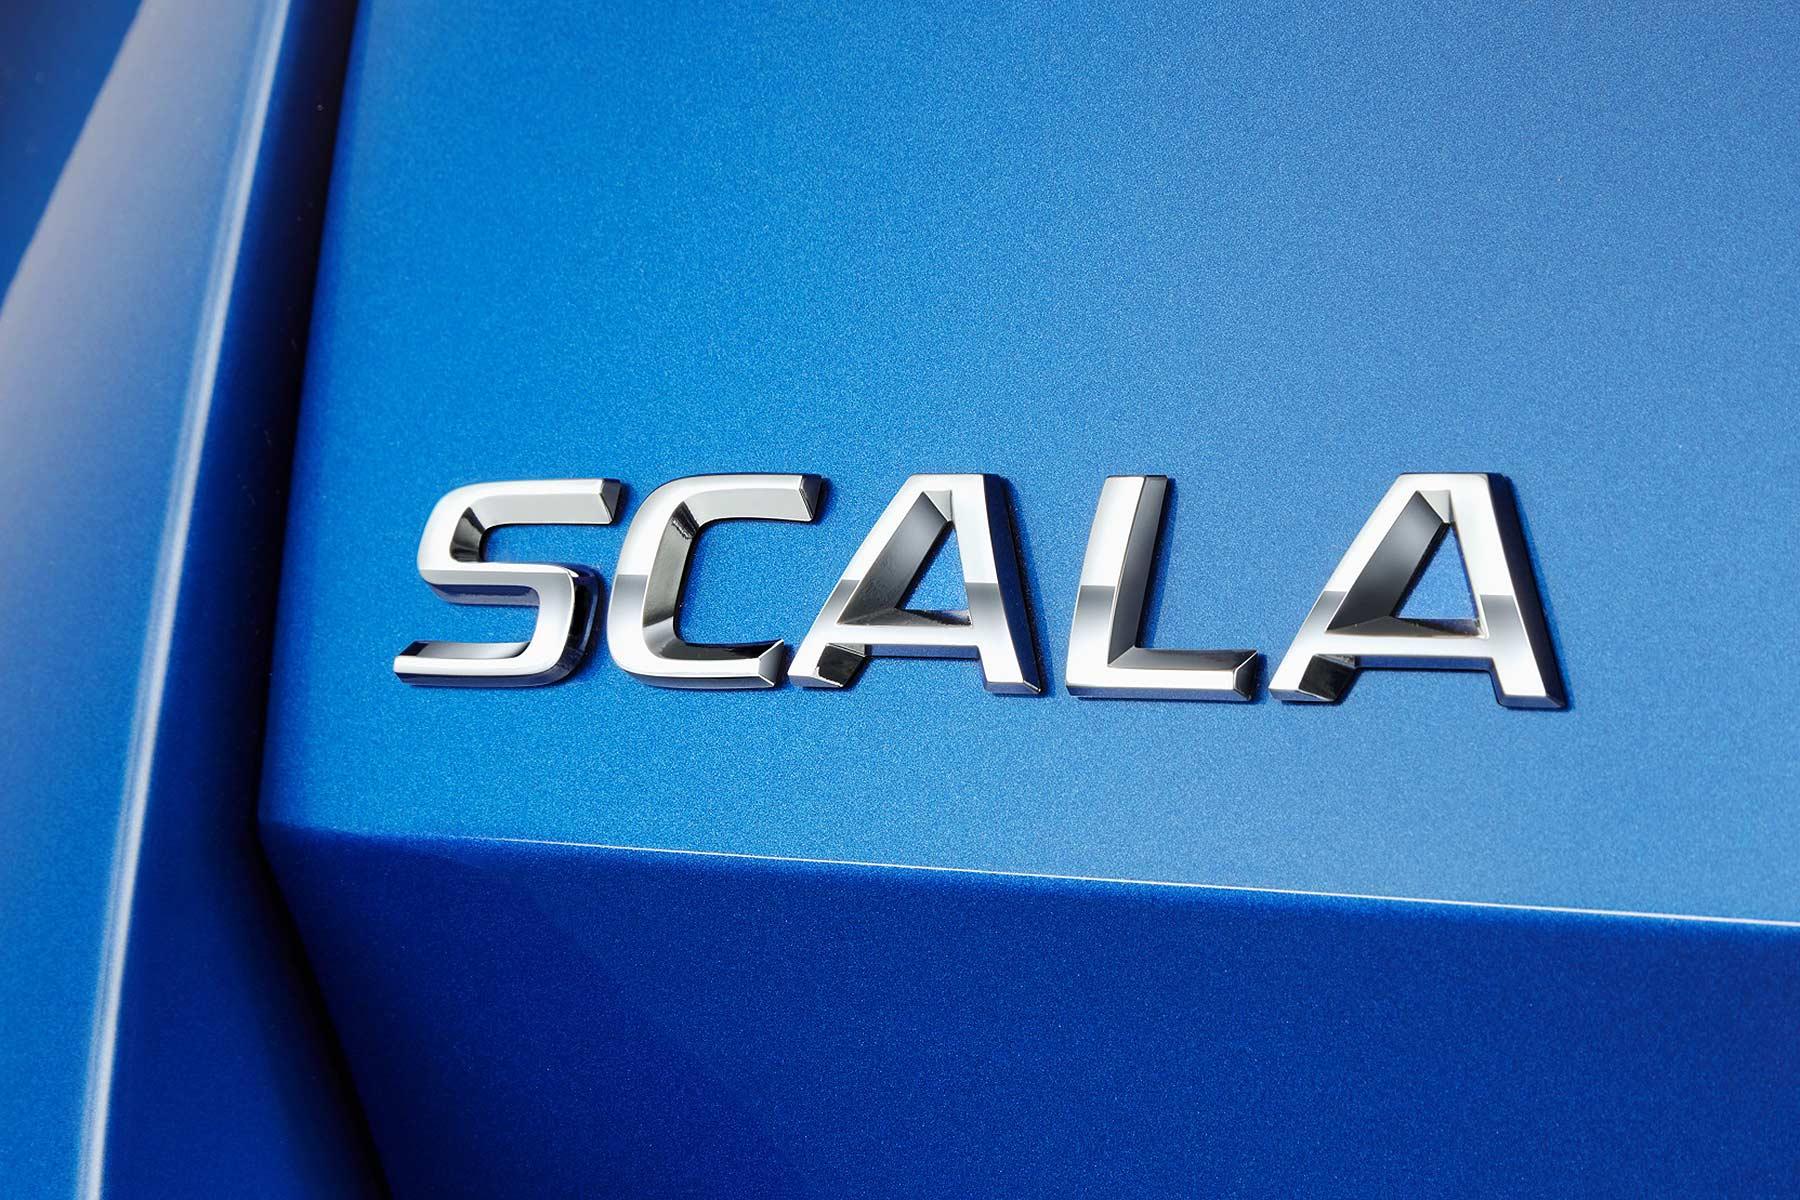 Skoda Scala badge